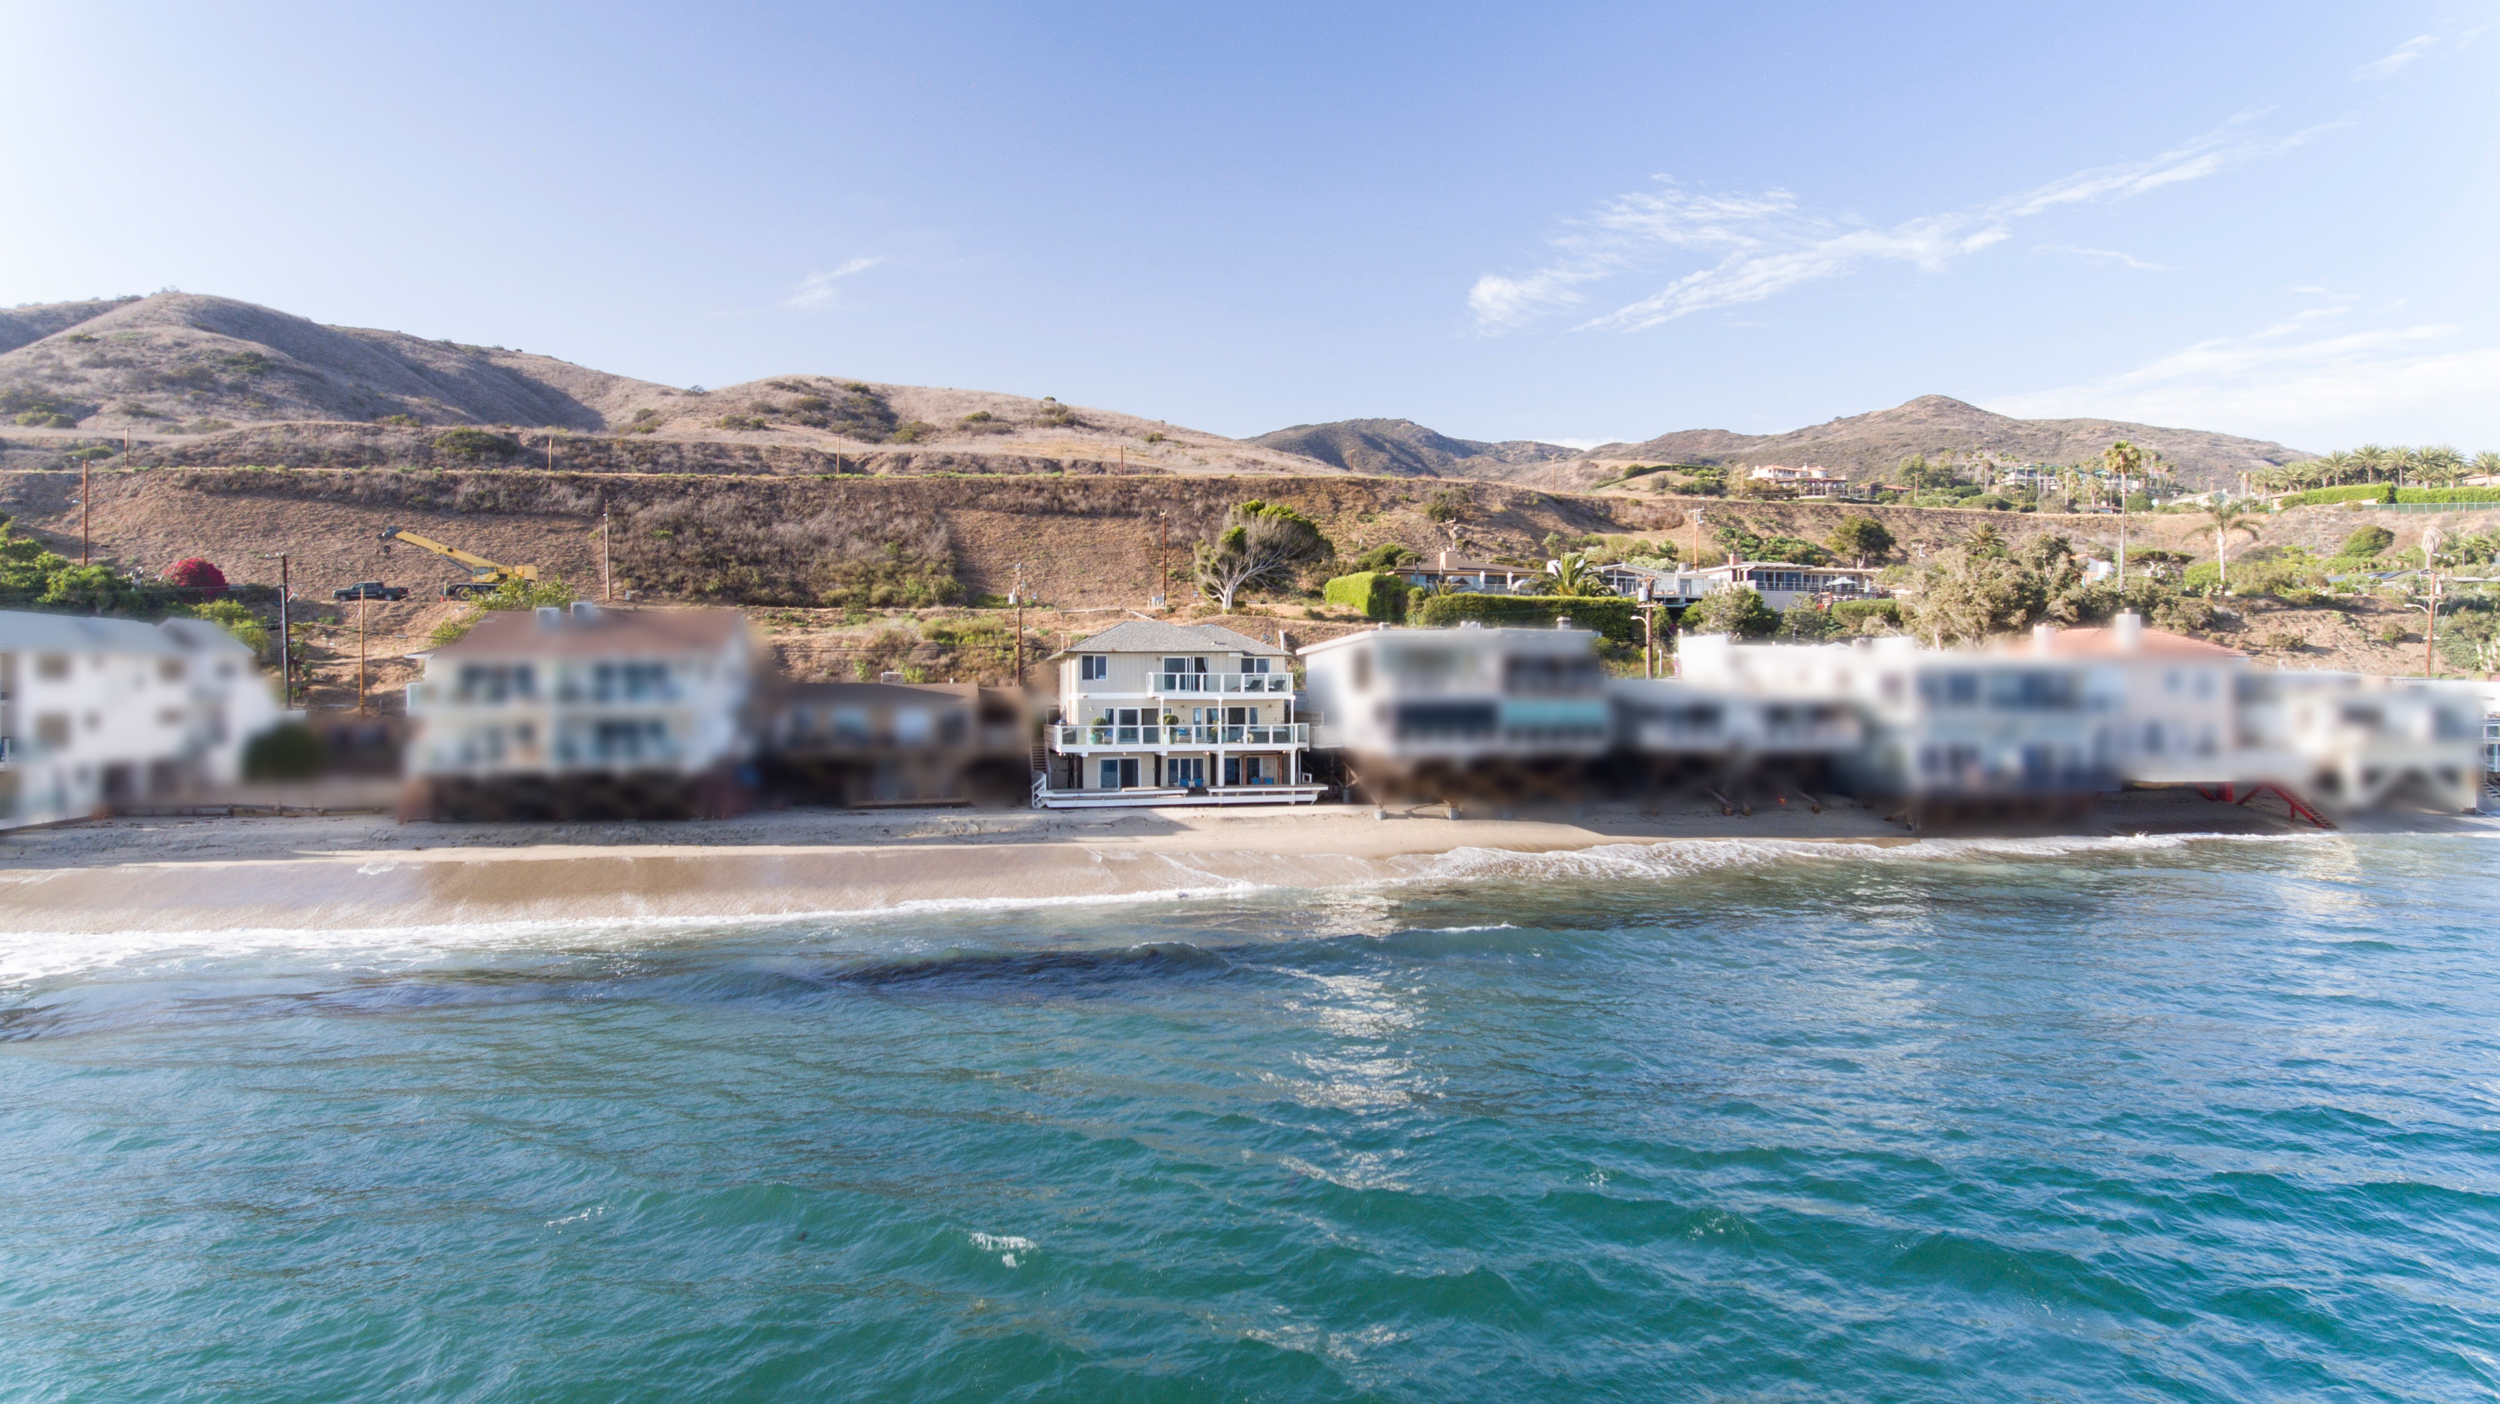 028 Aerial Blur 25342 Malibu Road For Sale Lease The Malibu Life Team Luxury Real Estate.jpg